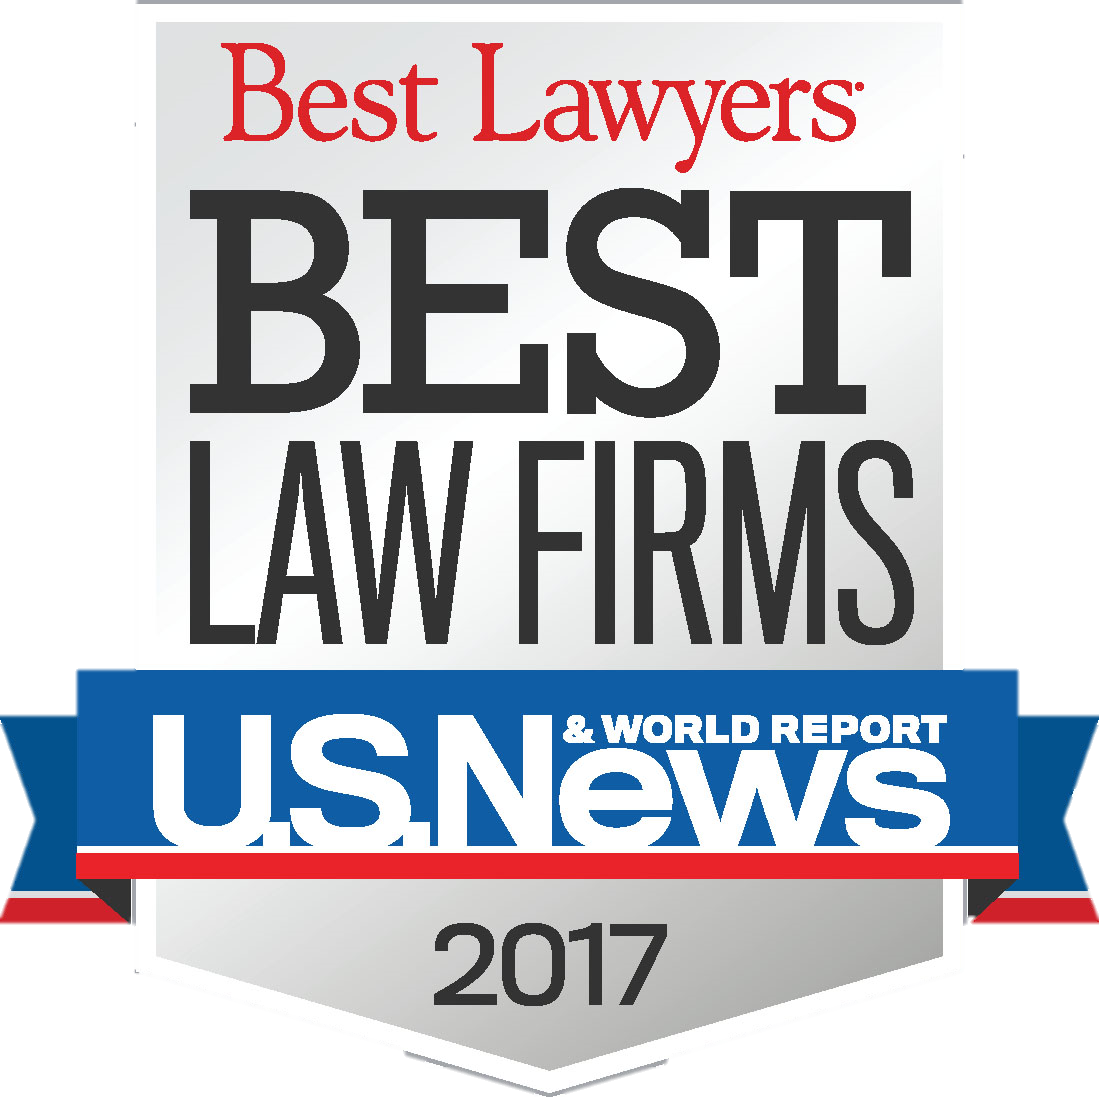 Best Lawyers, Best Law Firms 2016